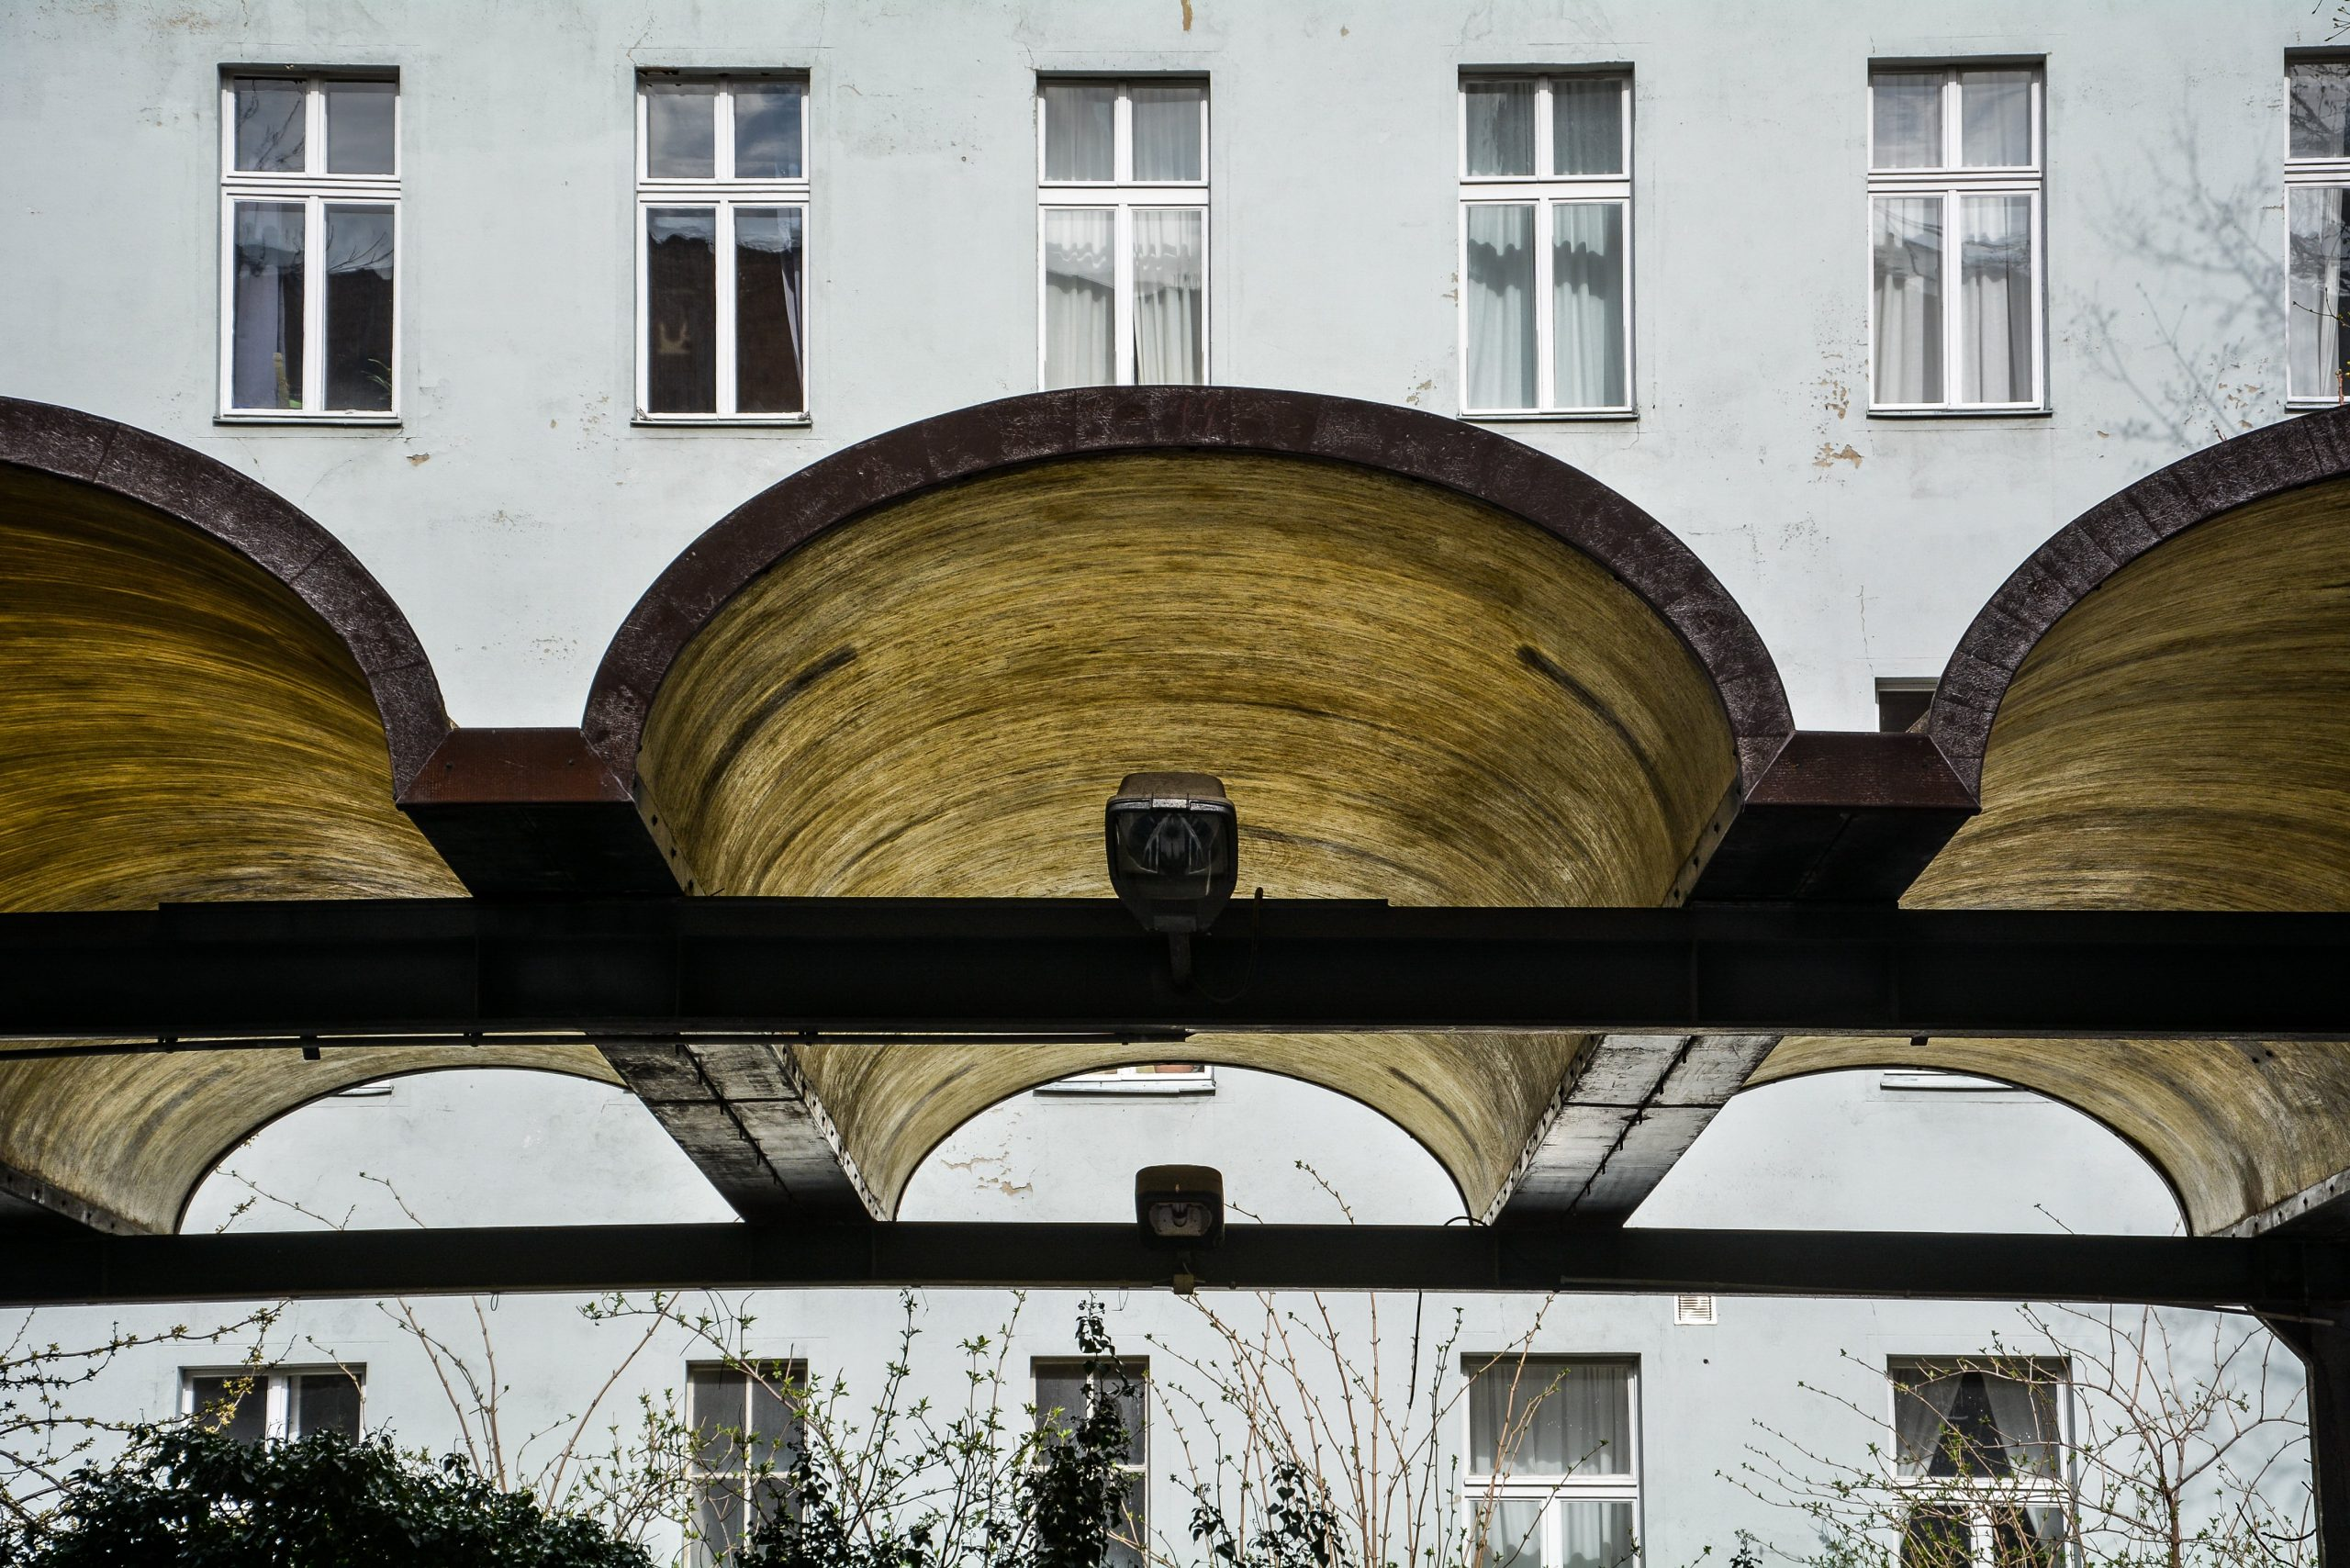 car port border roof grenzdach elaste bornholmer strasse border crossing prenzlauer berg berlin germany east germany